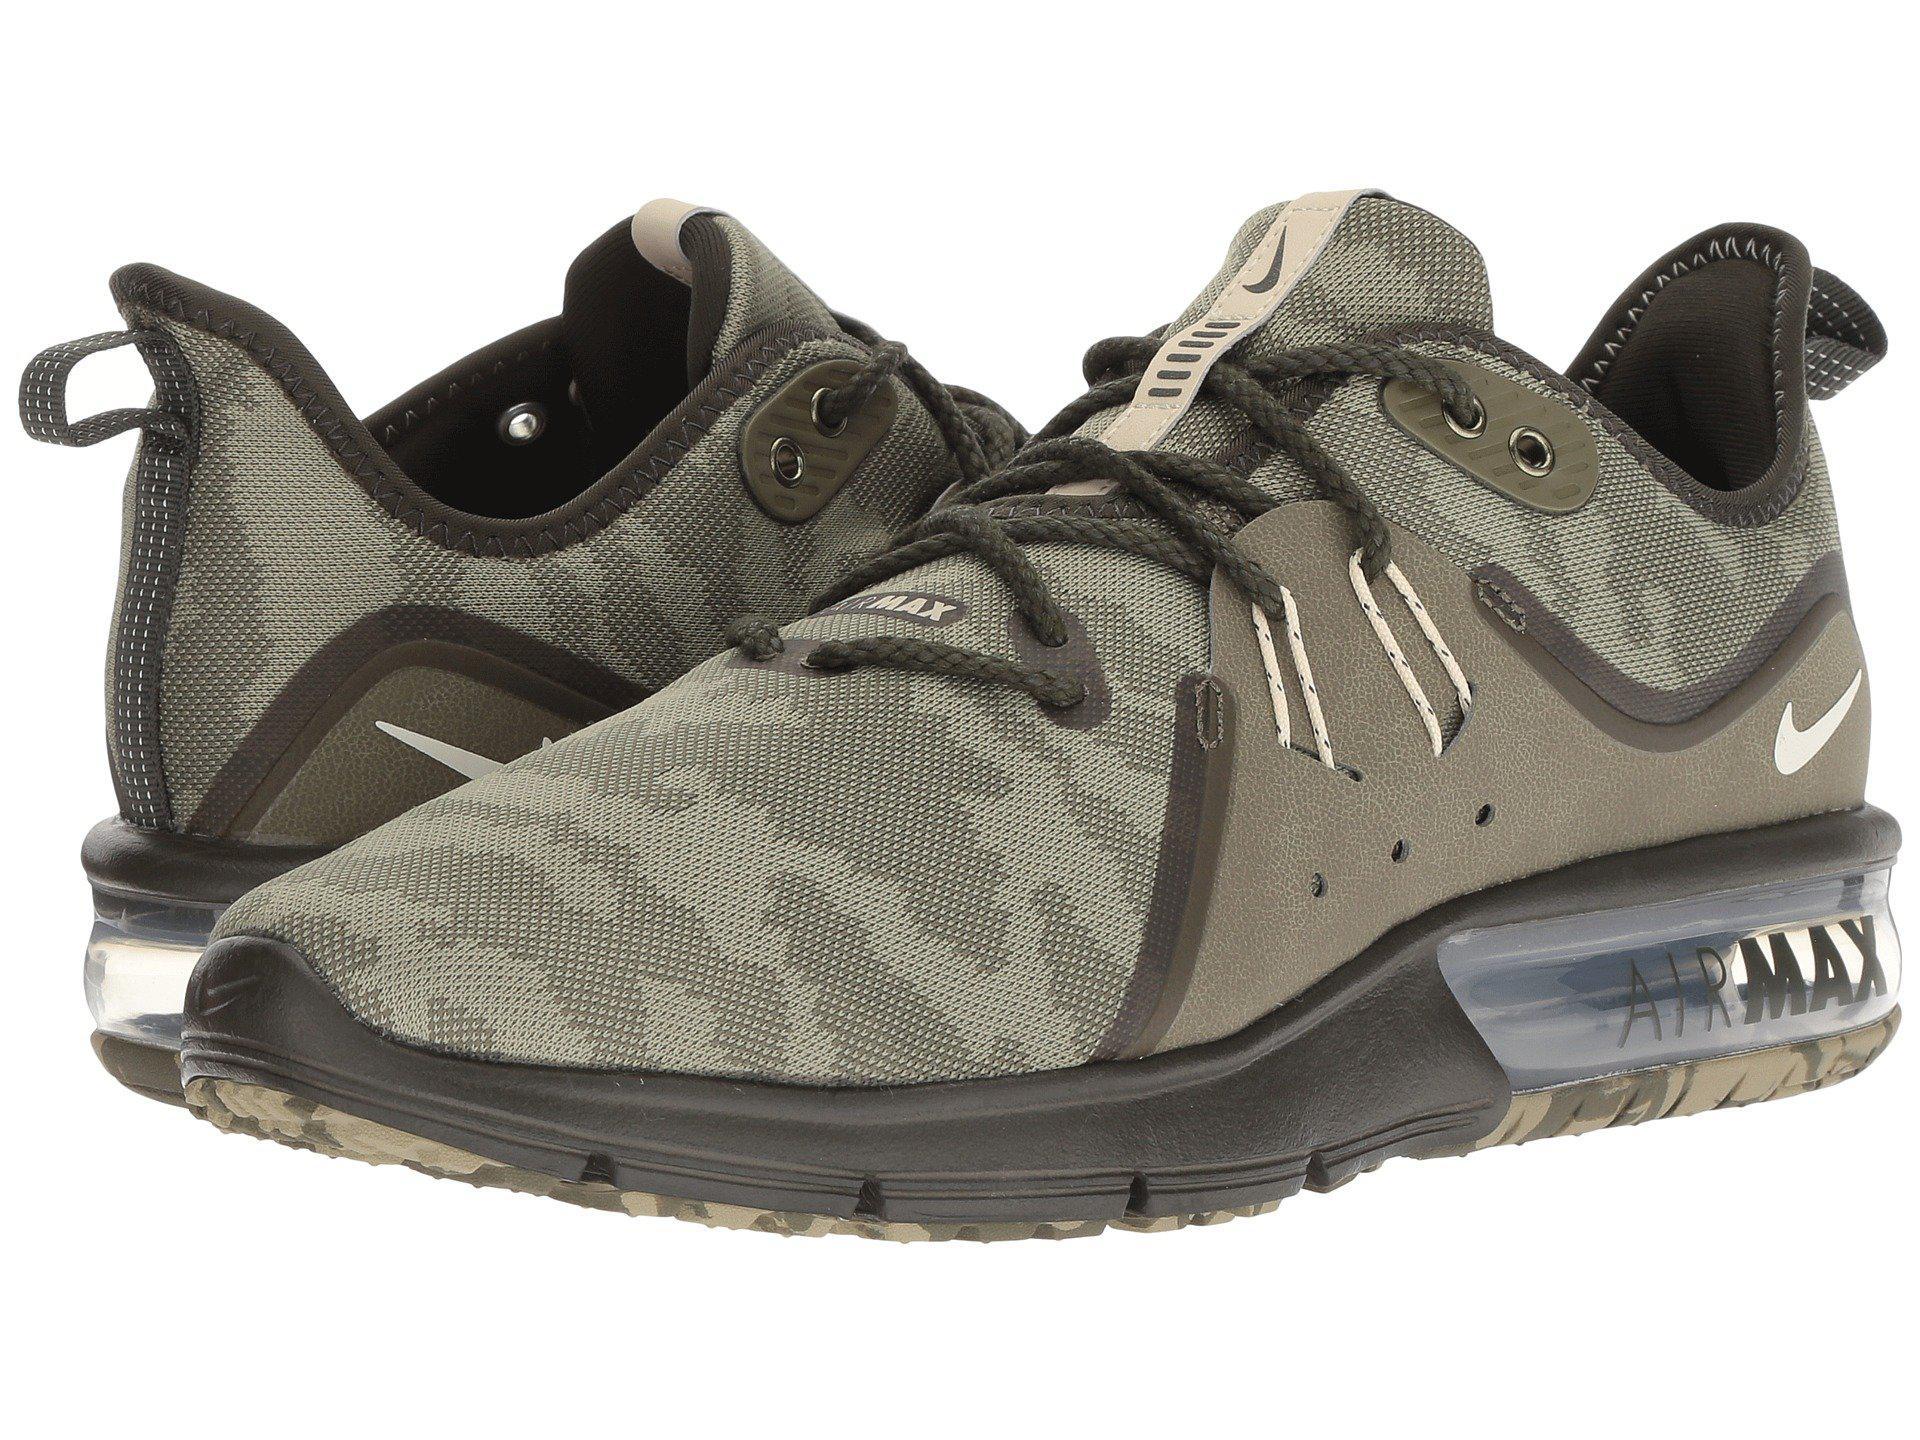 Lyst Nike Air Max Sequent 3 Premium (Noir/dark Gris) Homme